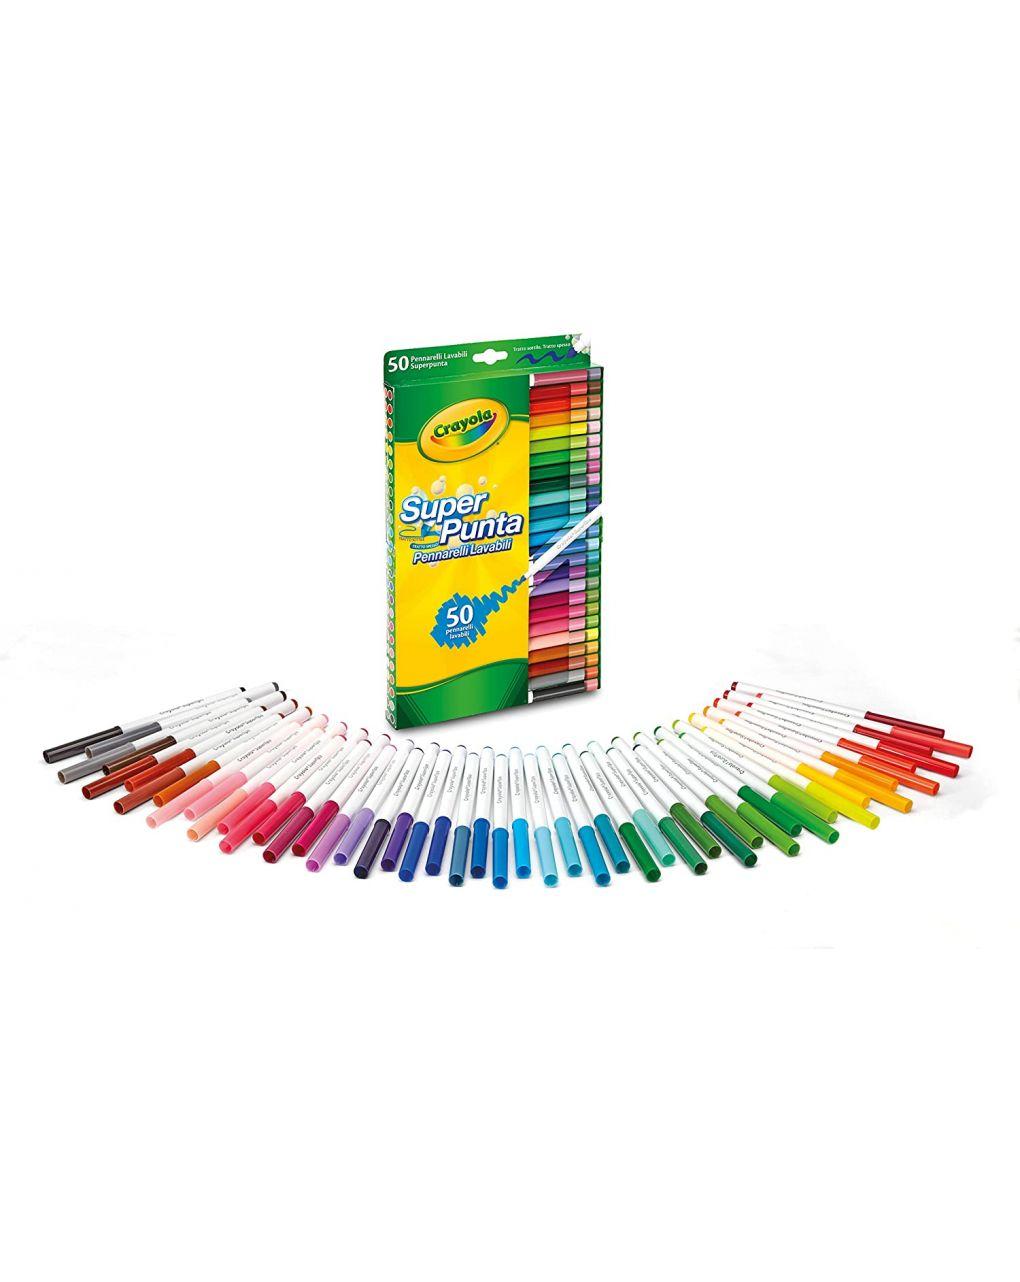 Crayola - 50 pennarelli superpunta lavabili - Crayola